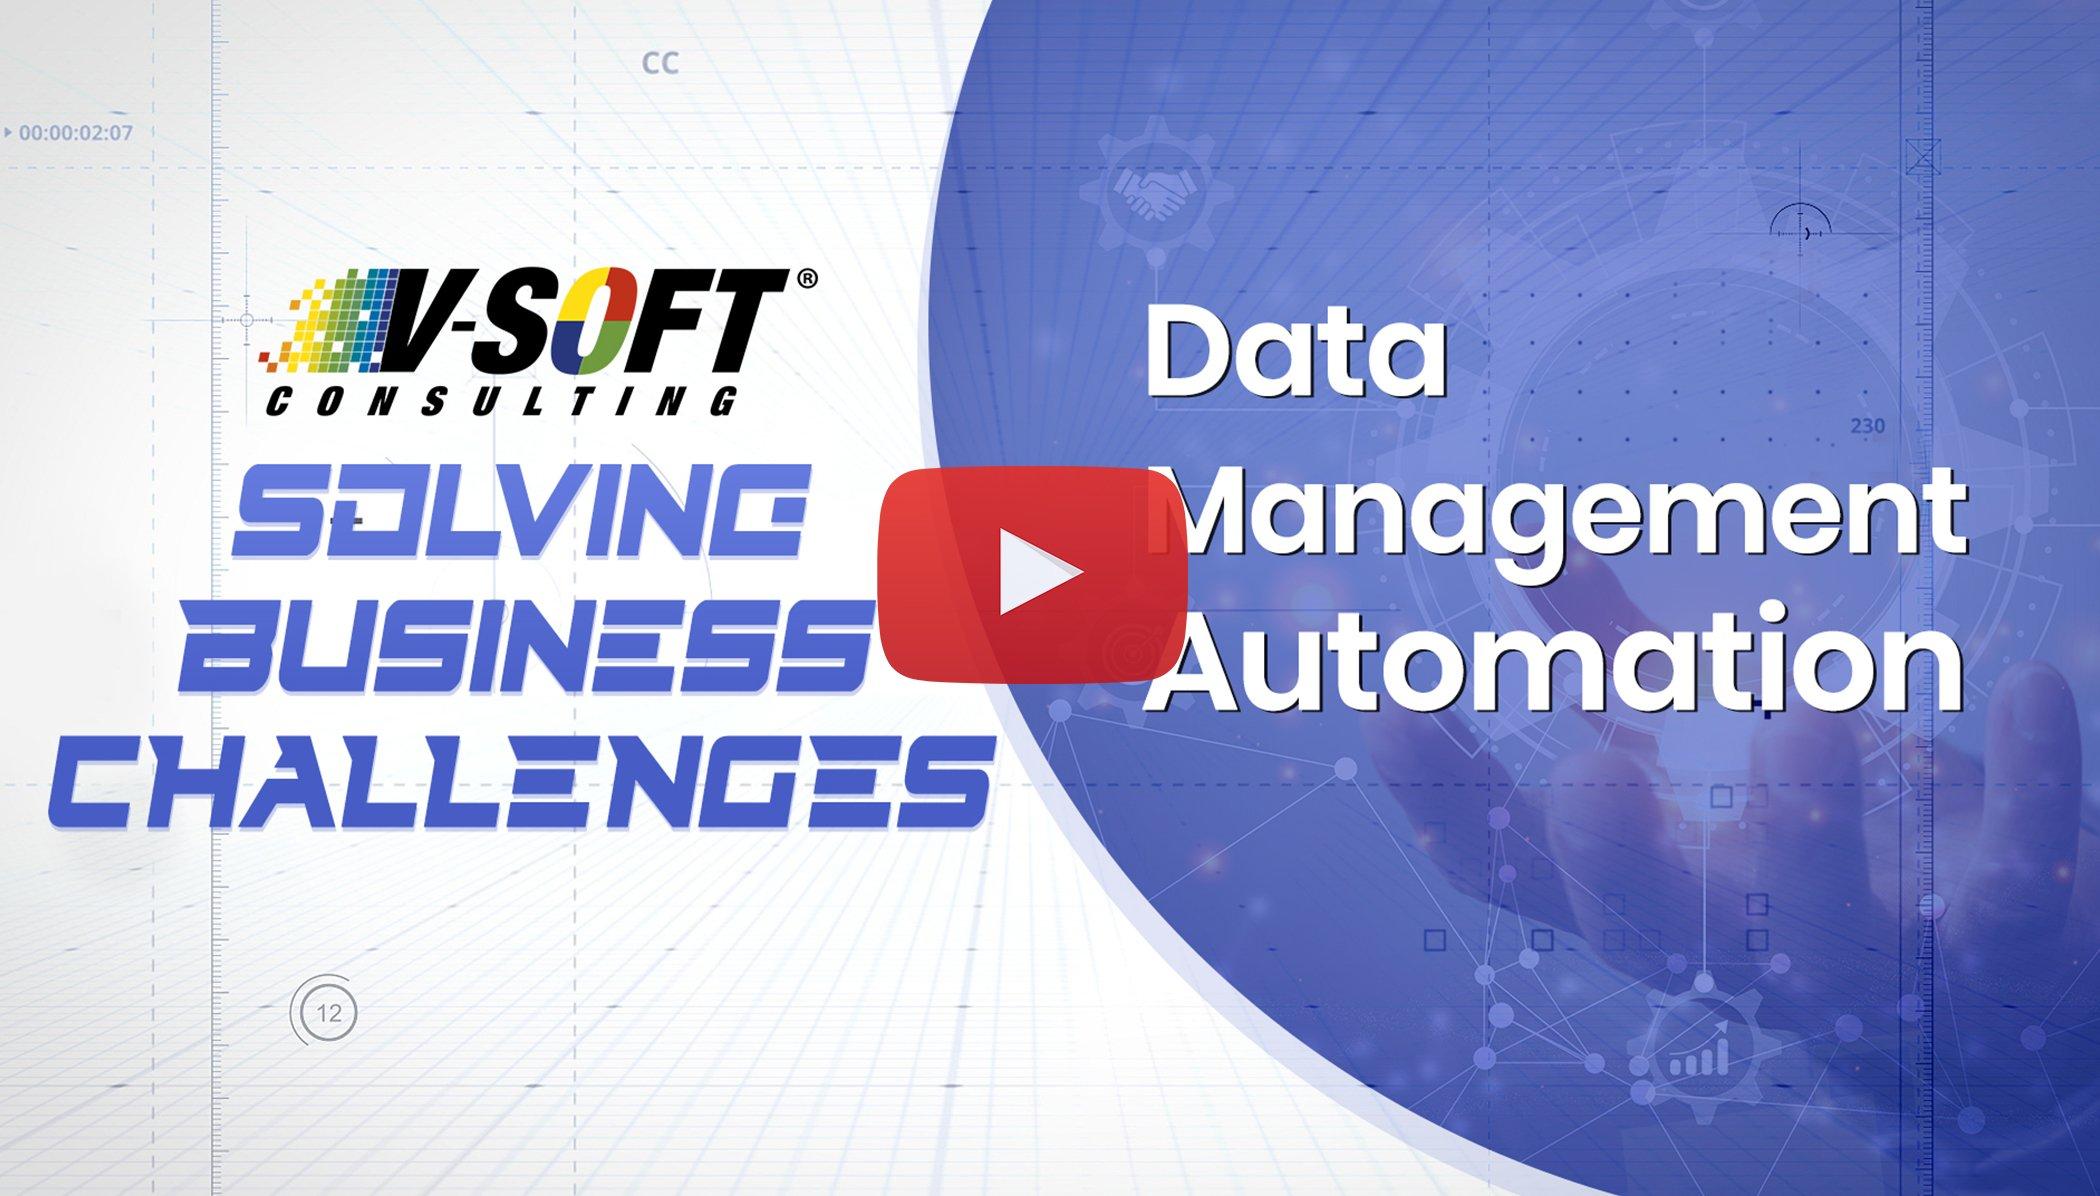 Data Management Automation Case Study